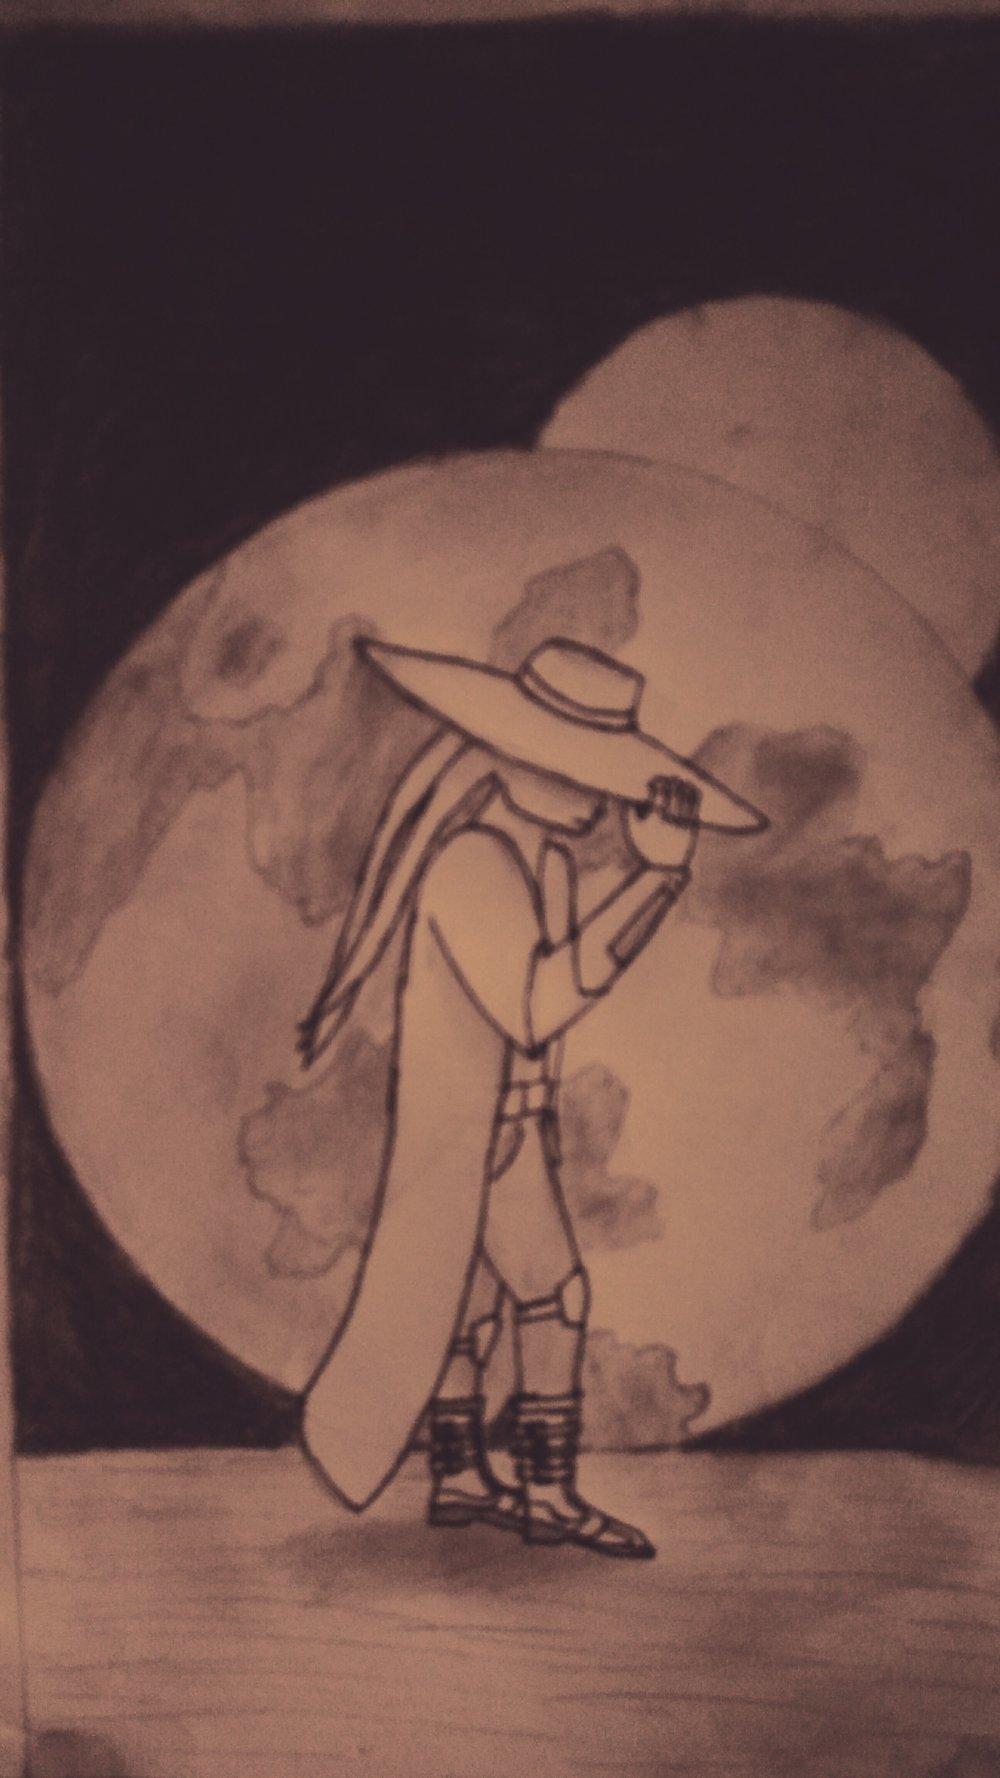 Hand drawn Sketch of a Du'lak Bounty hunter